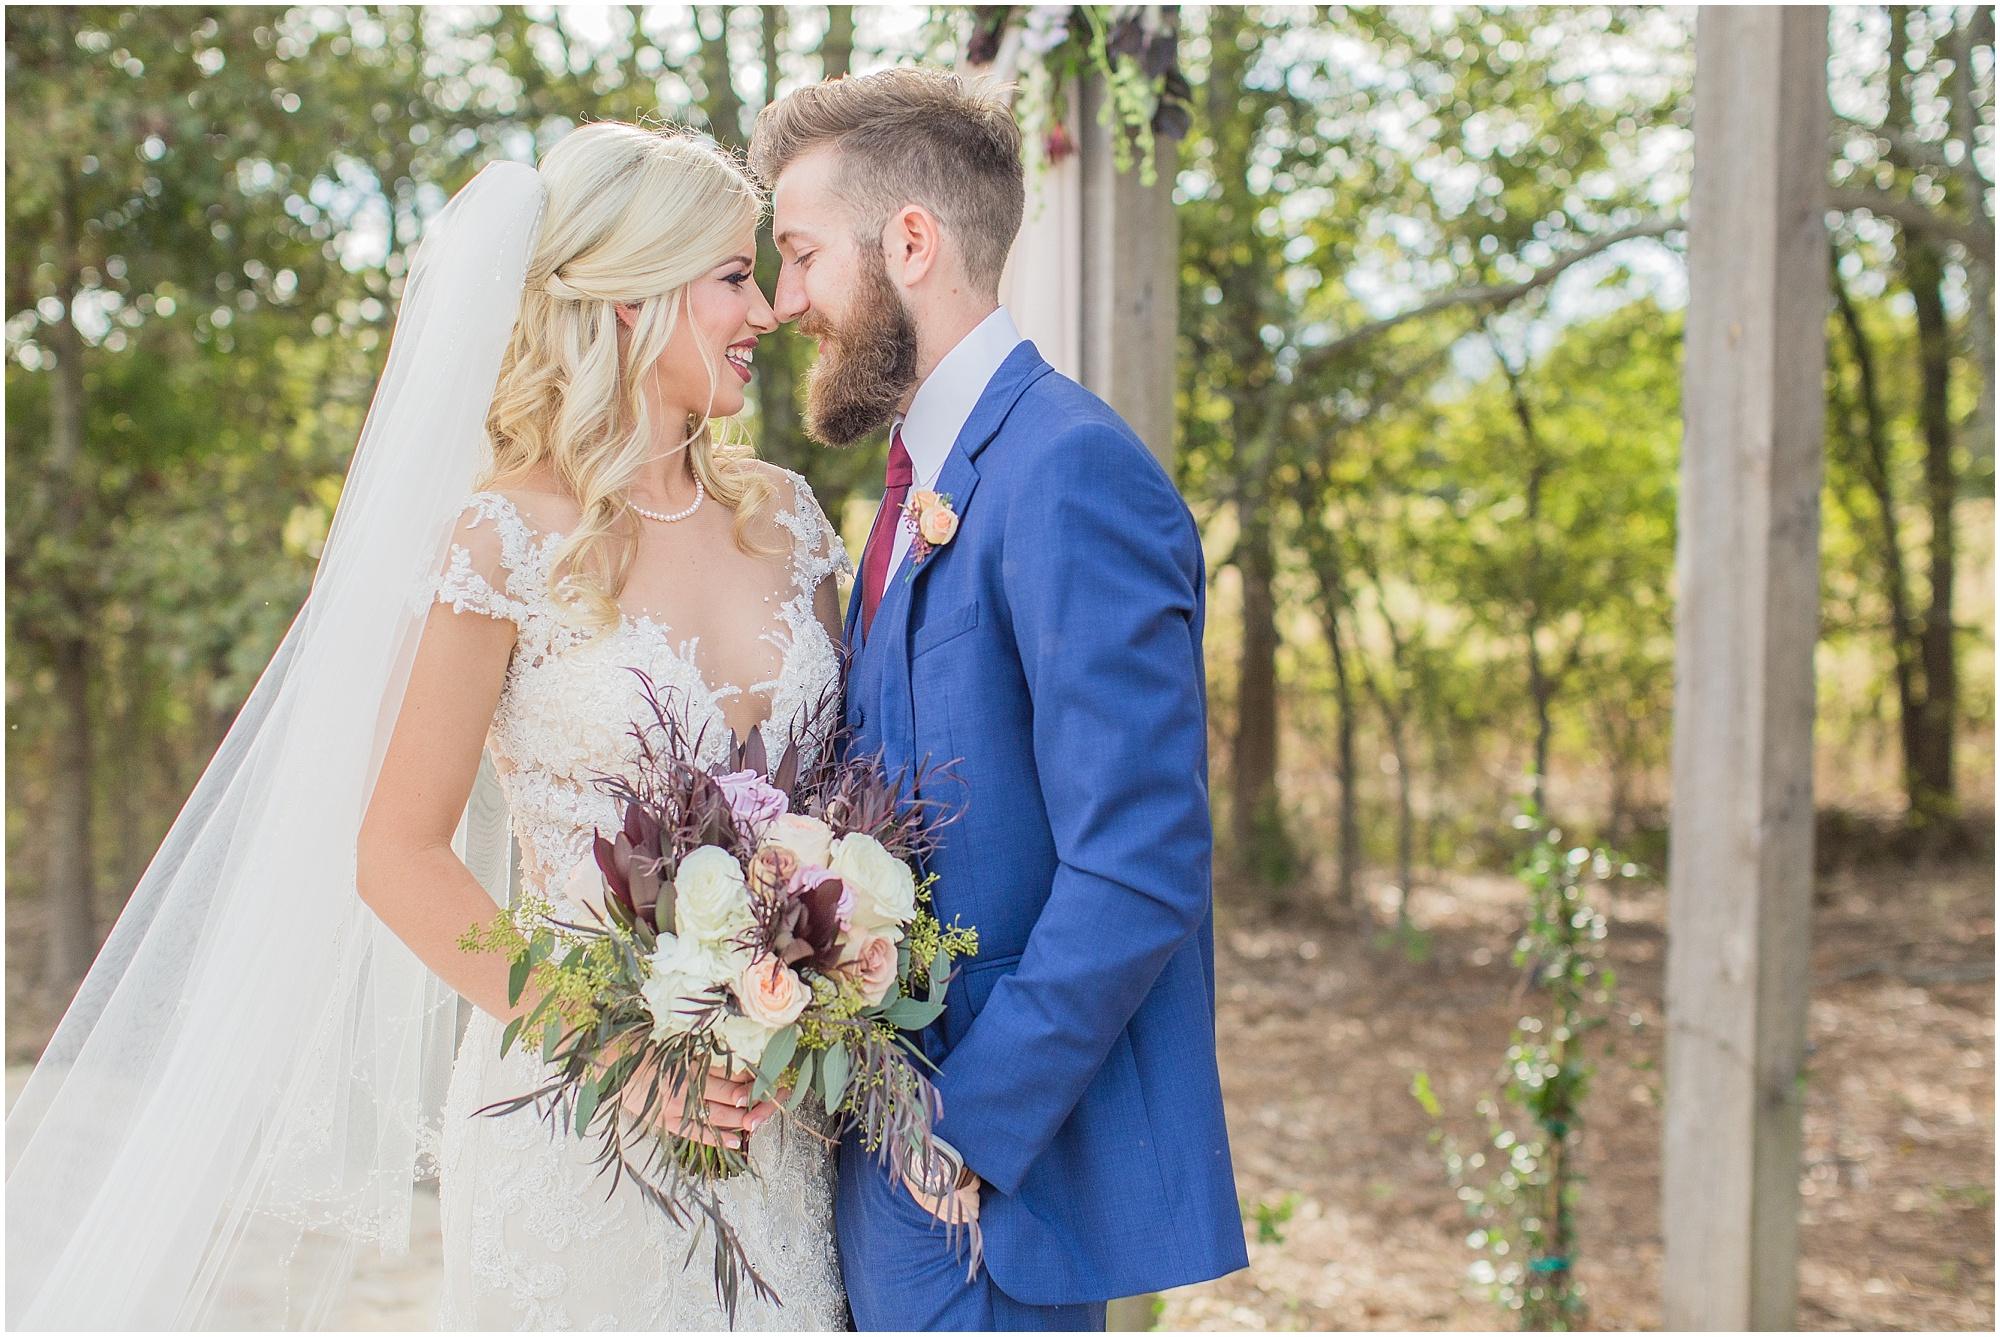 fall-wedding-bridlewood-of-madison-mississippi_0018.jpg